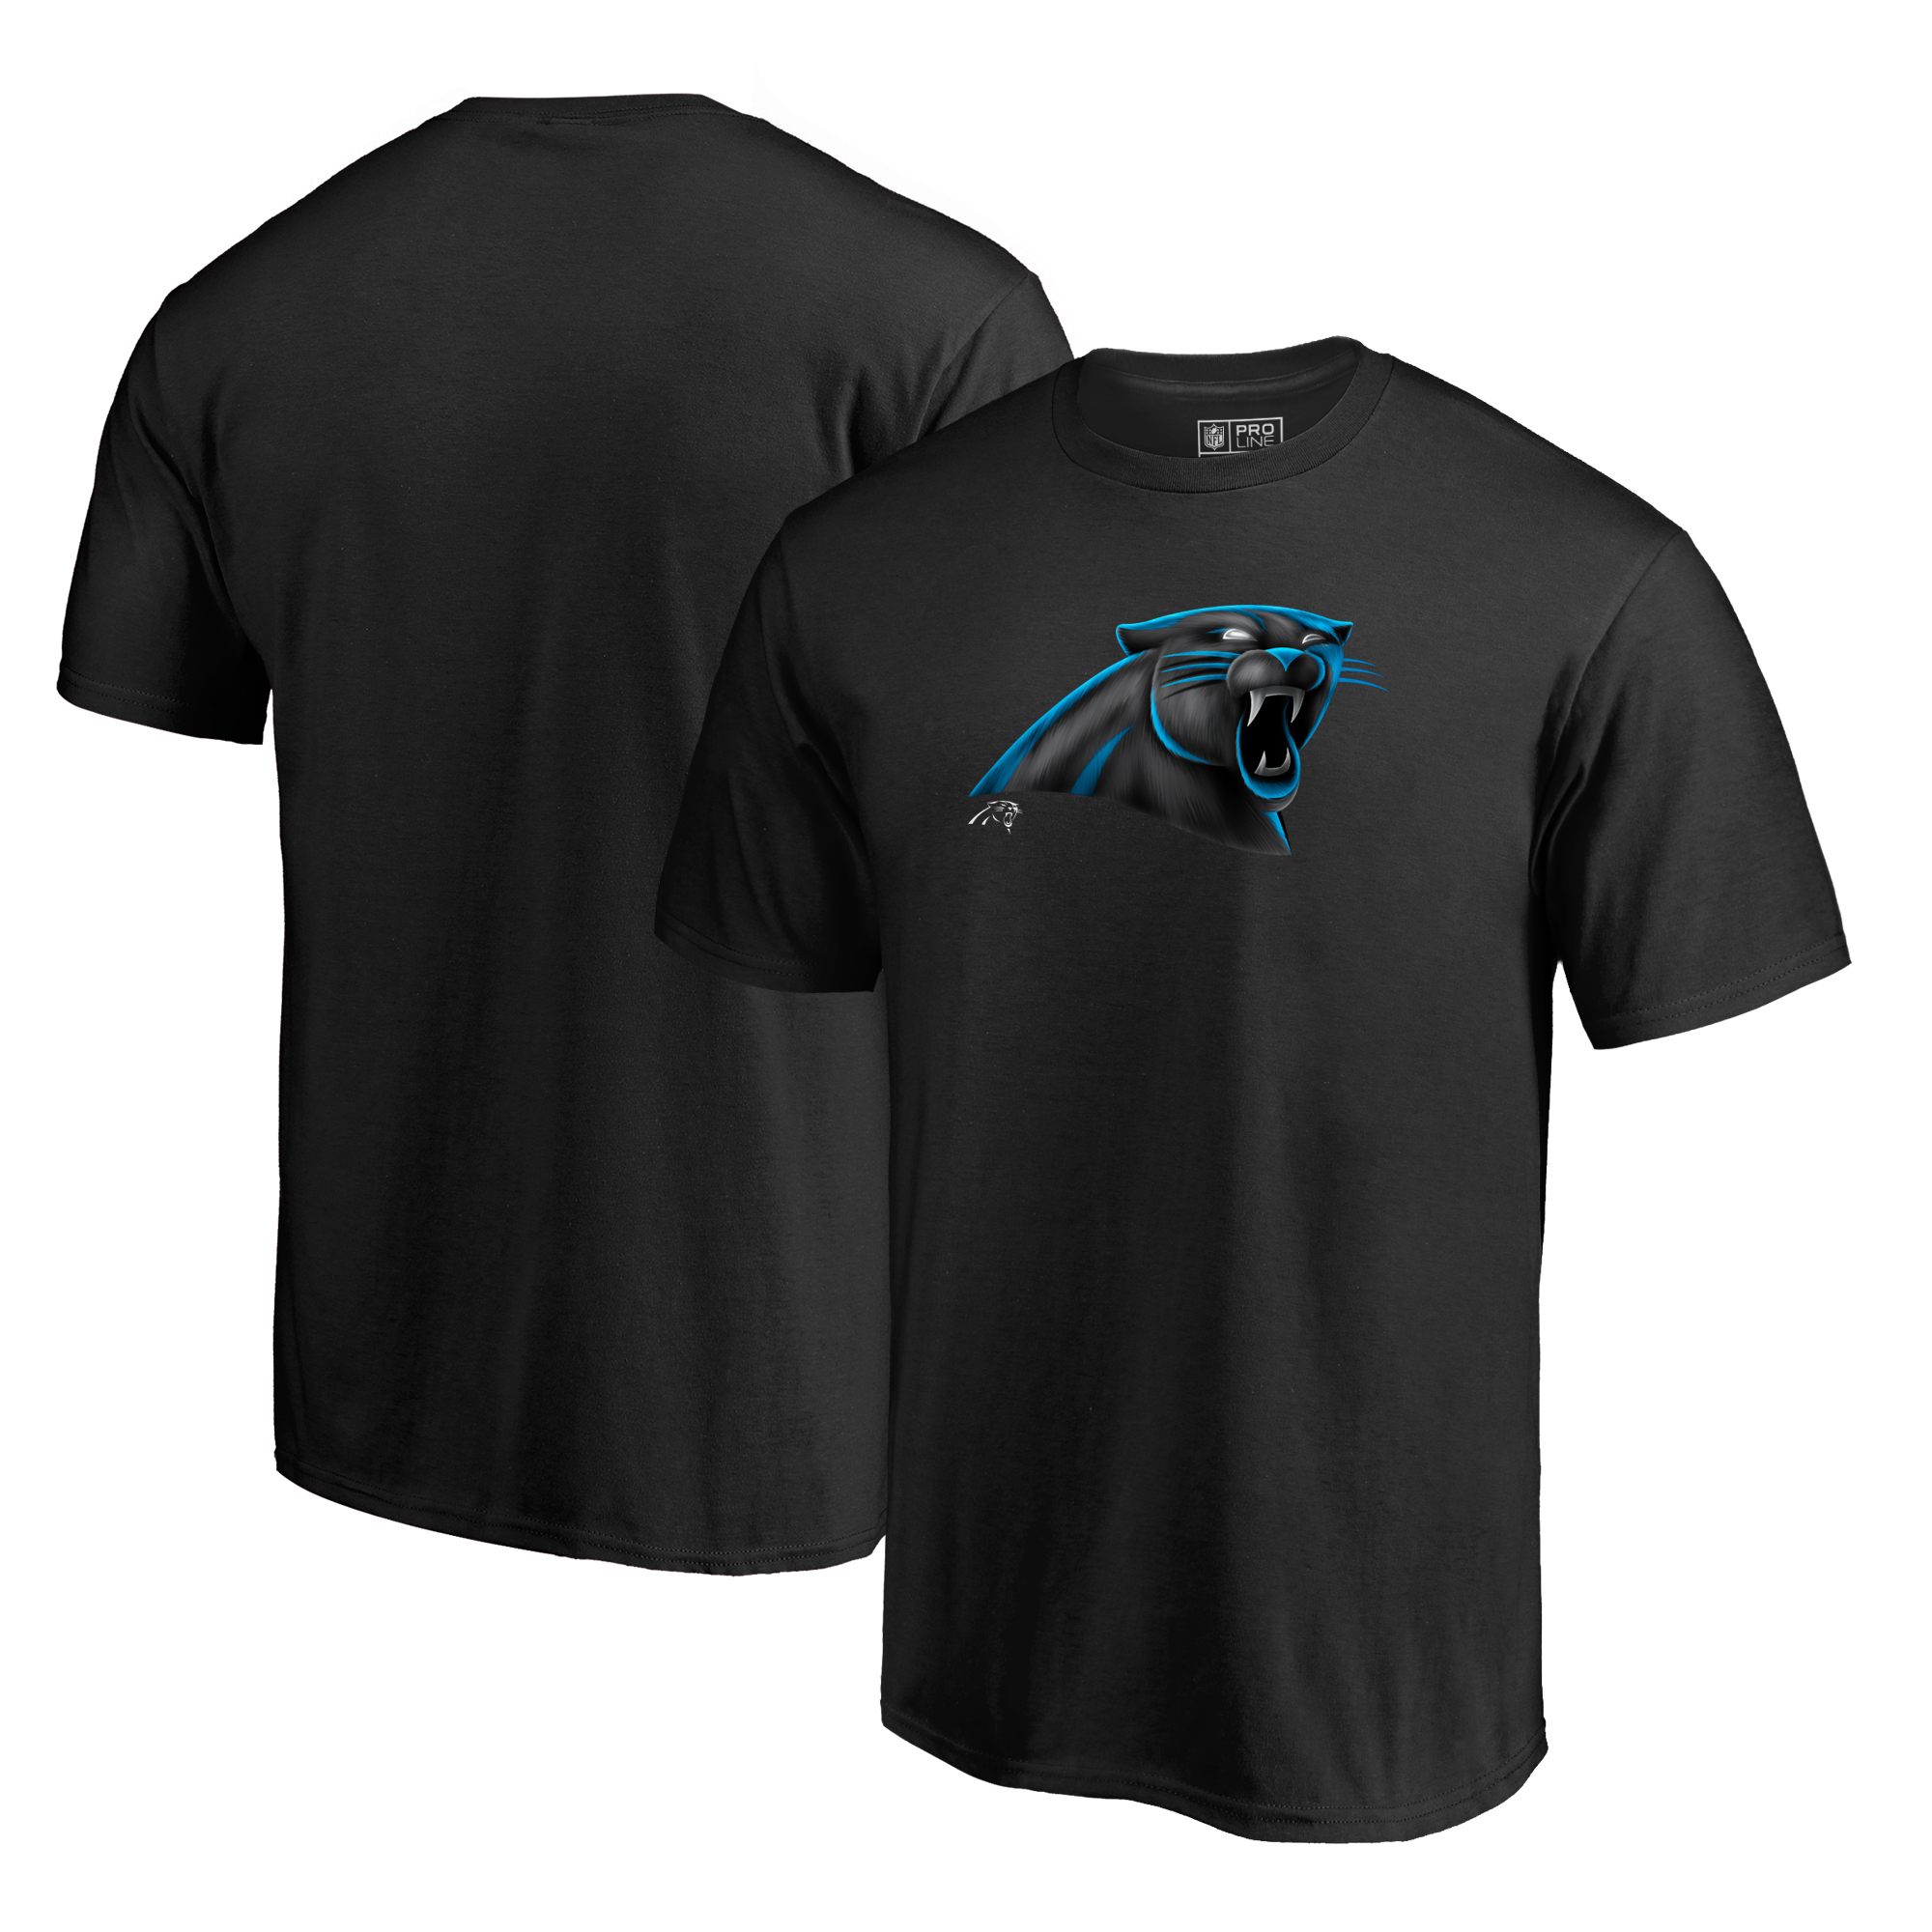 Carolina Panthers NFL Pro Line by Fanatics Branded Midnight Mascot T-Shirt - Black